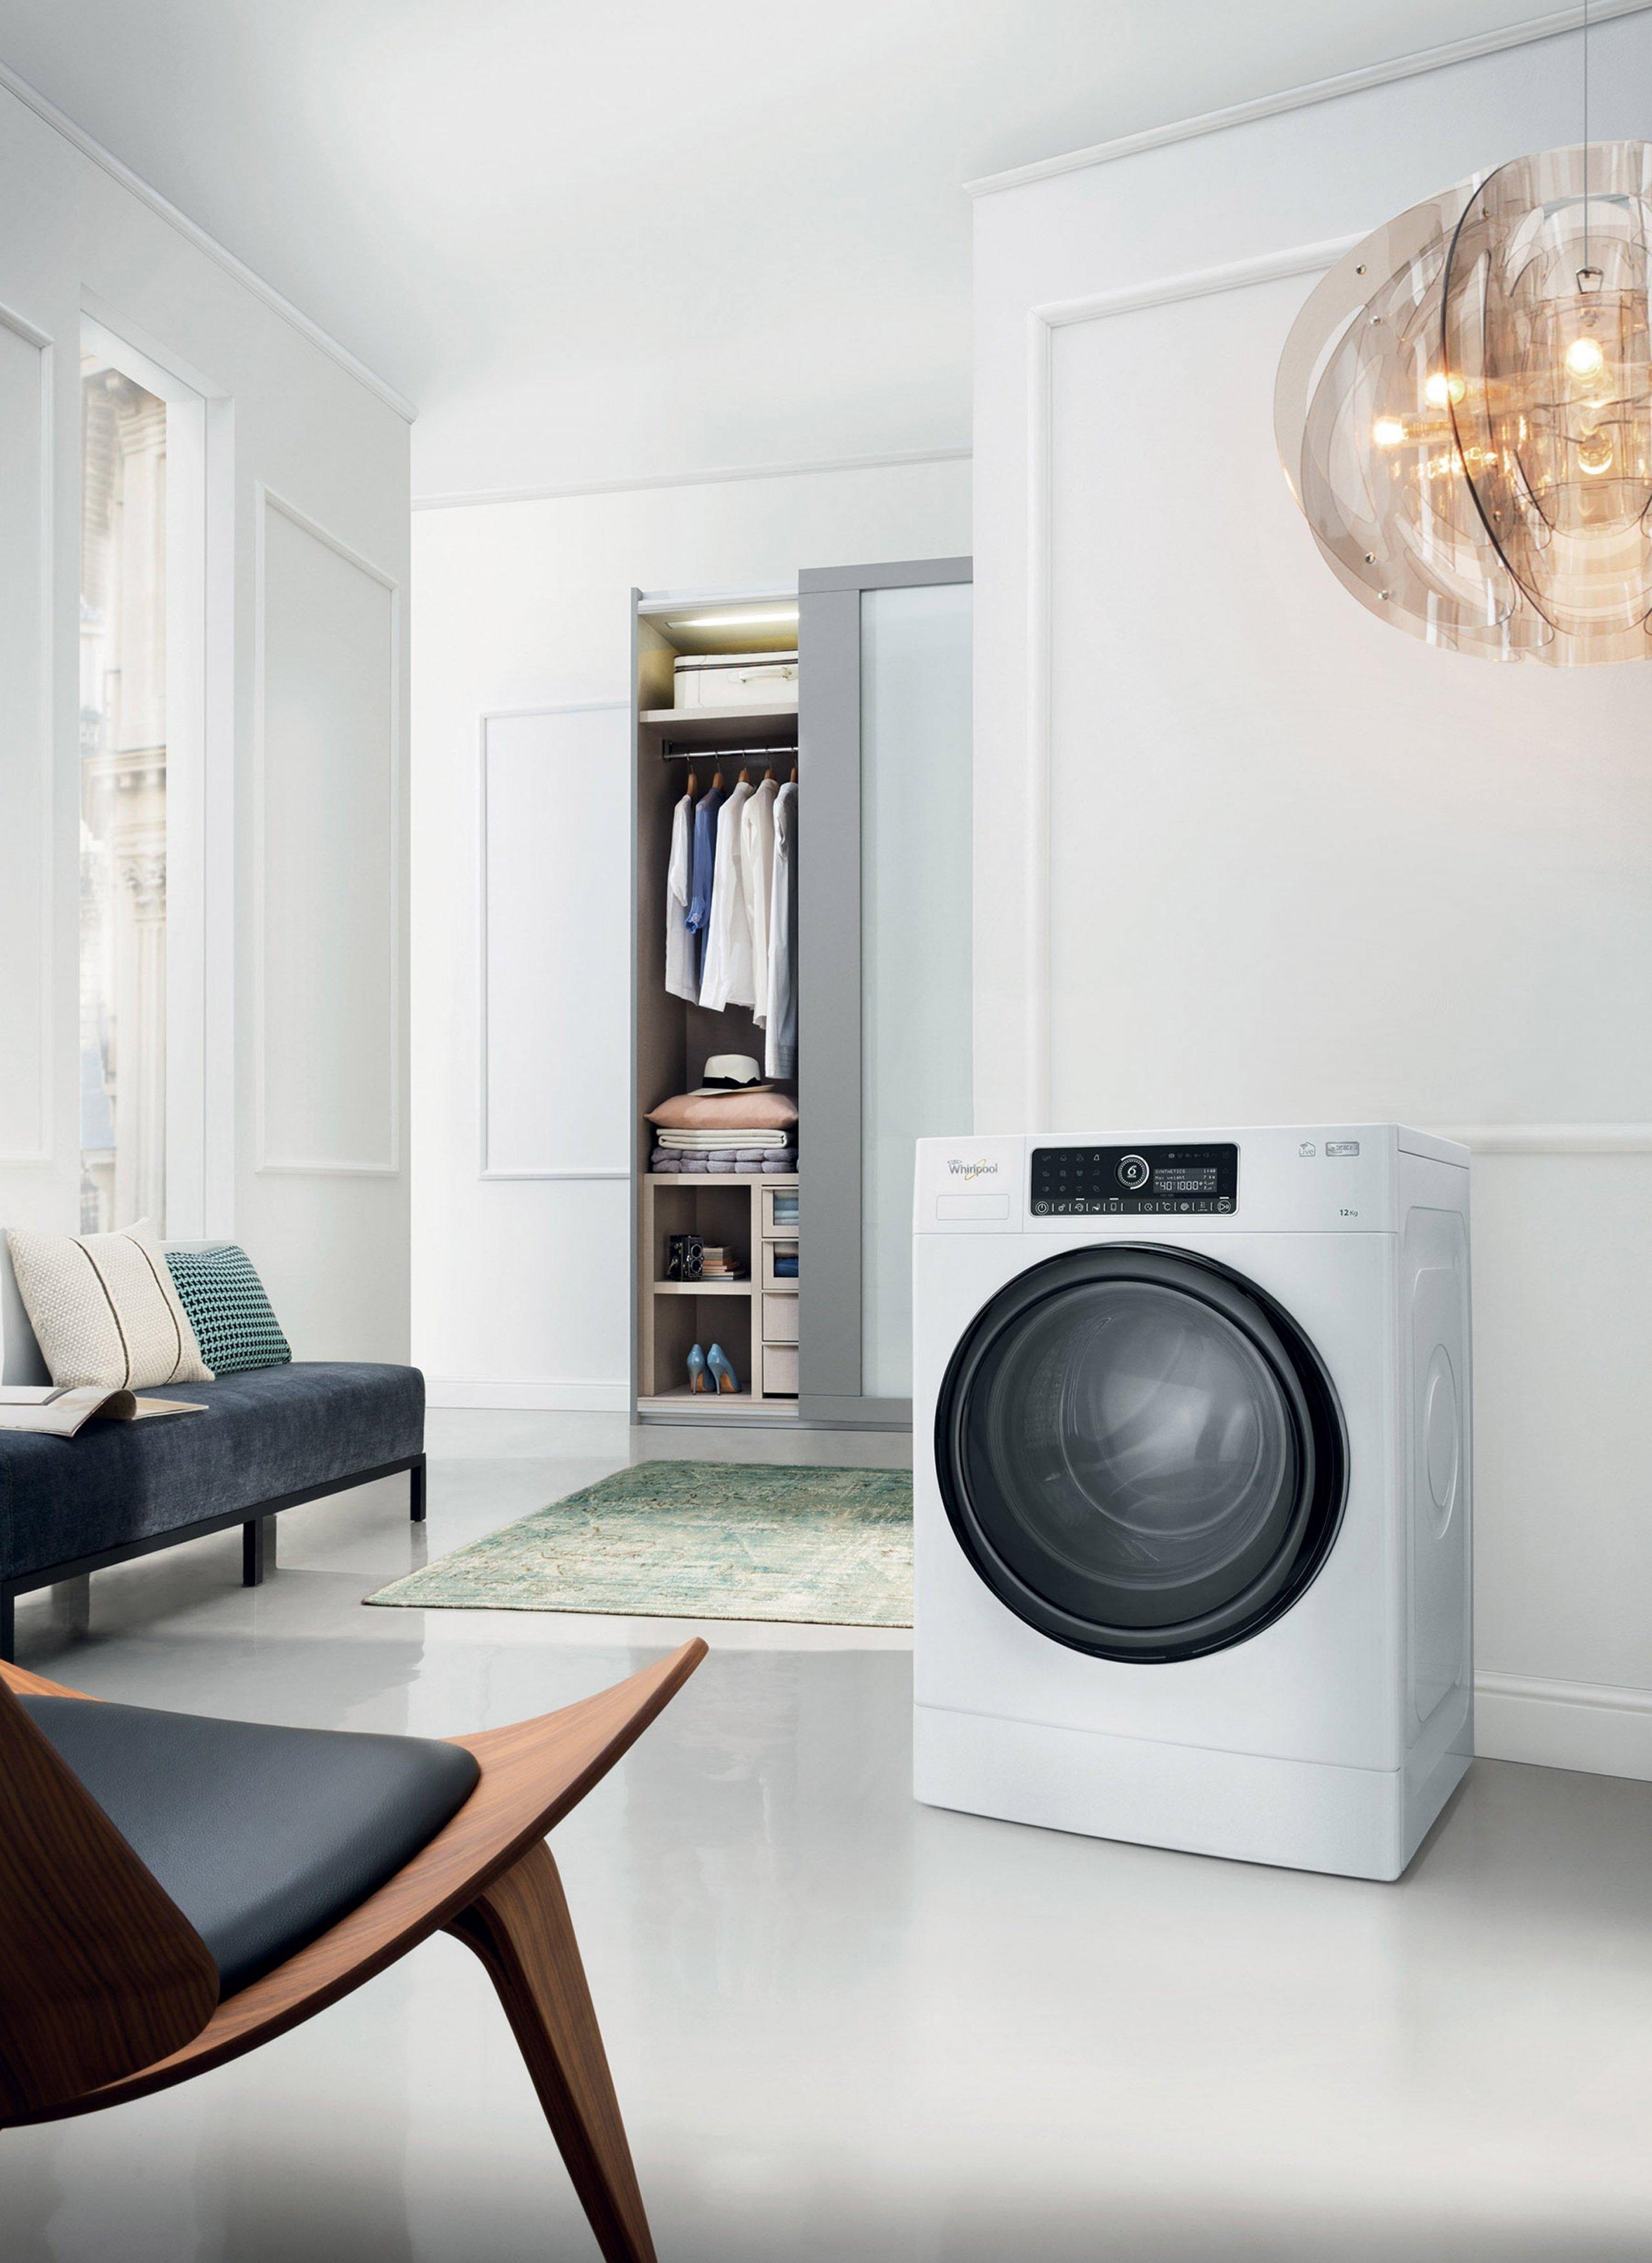 Rébus zvaný pračka - kam umístit pračku?